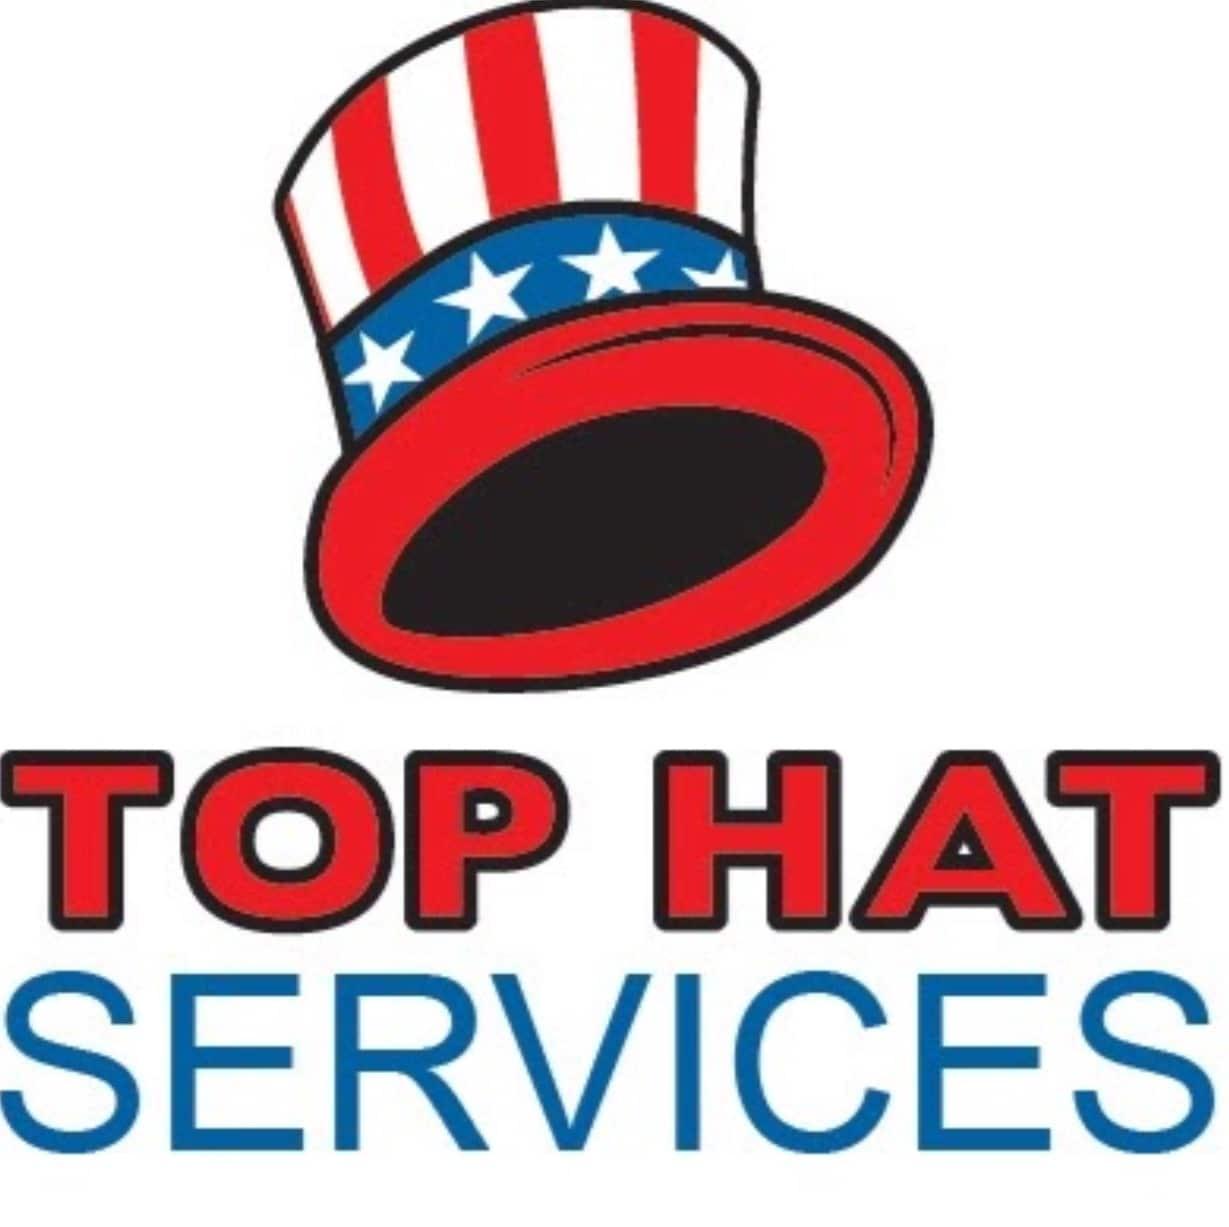 Top Hat Services